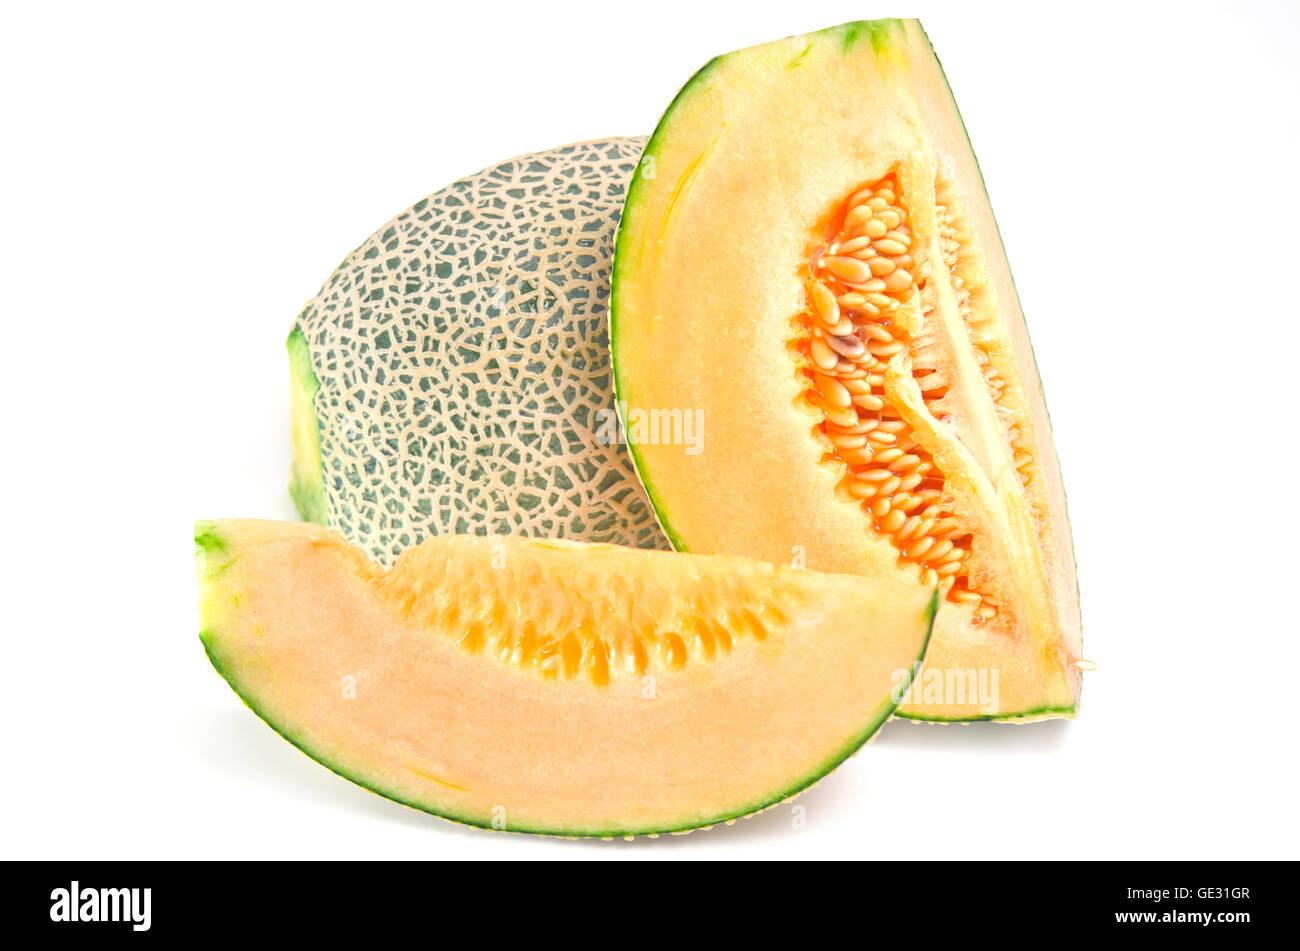 Cucumis Melo oder Melone-Serie im Stahl-Tray (andere Namen sind León, Cantaloup, Honigtau, Crenshaw, Casaba, Stockbild